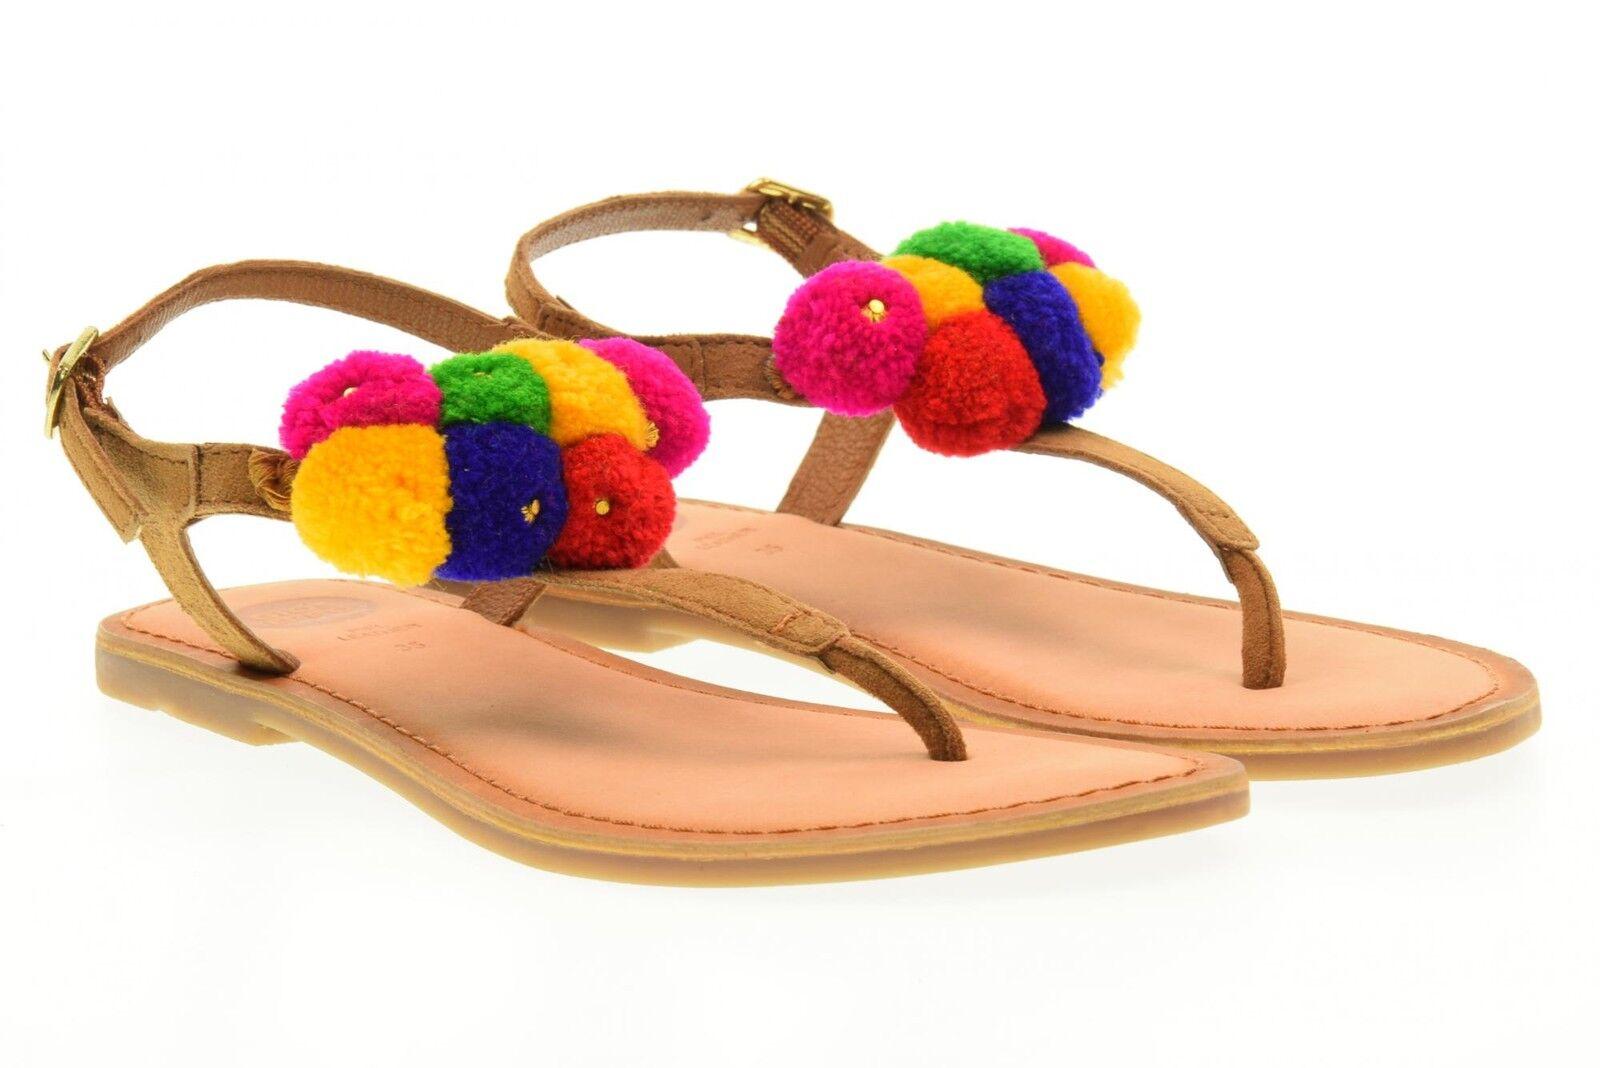 Gioseppo chaussures bambina infradito 39317-30 HATAE P17